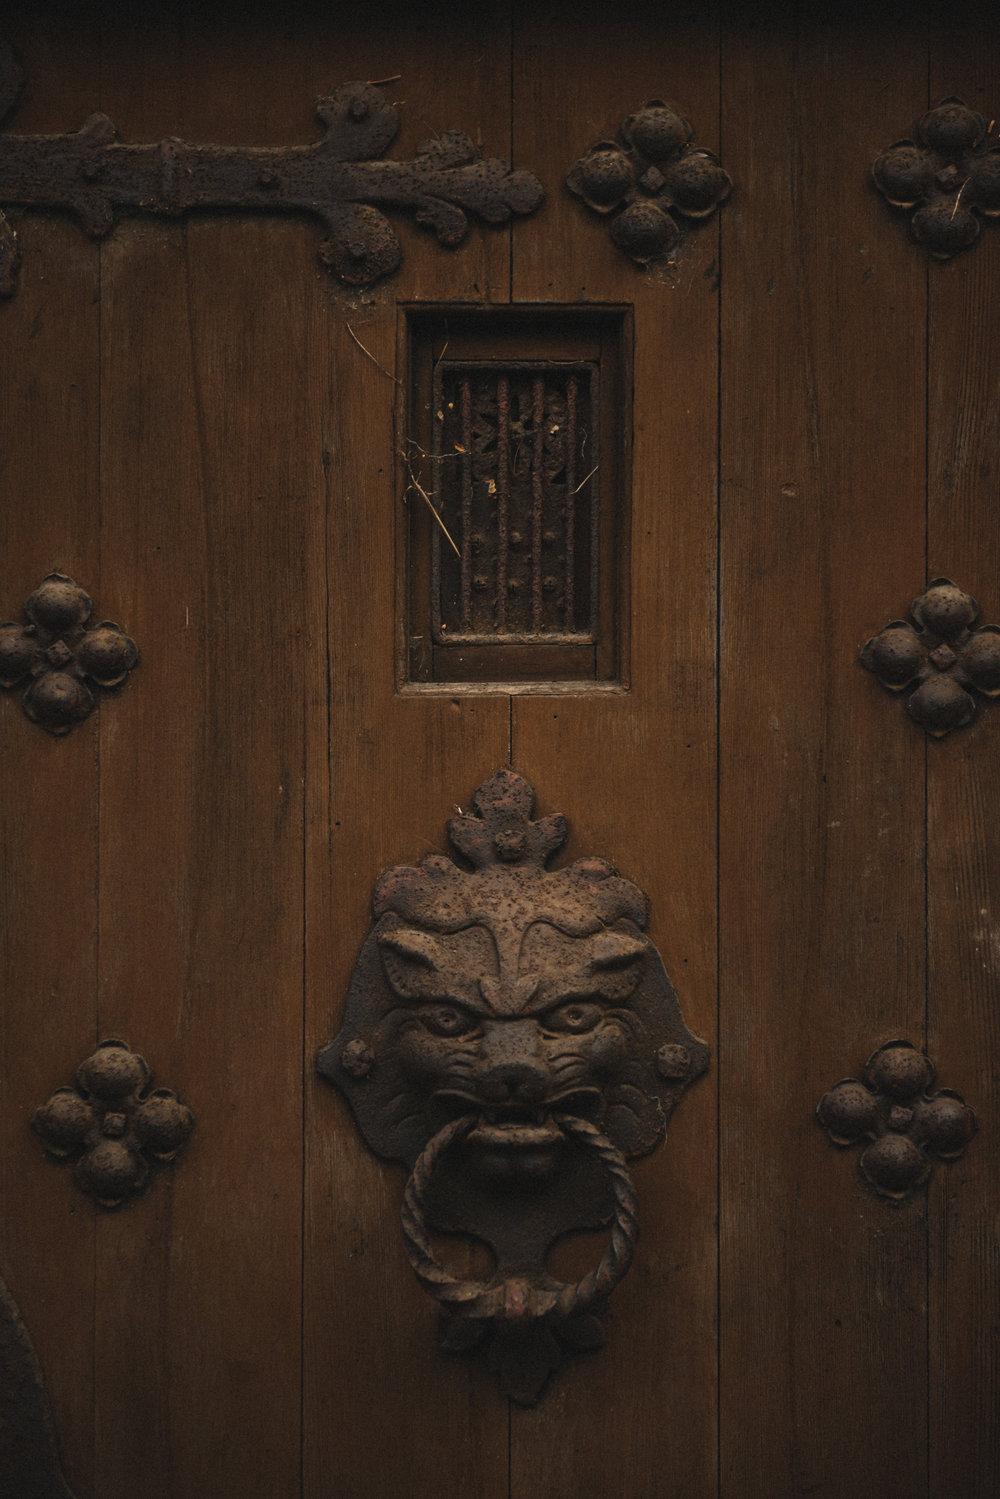 melissademata.com | Albion Castle